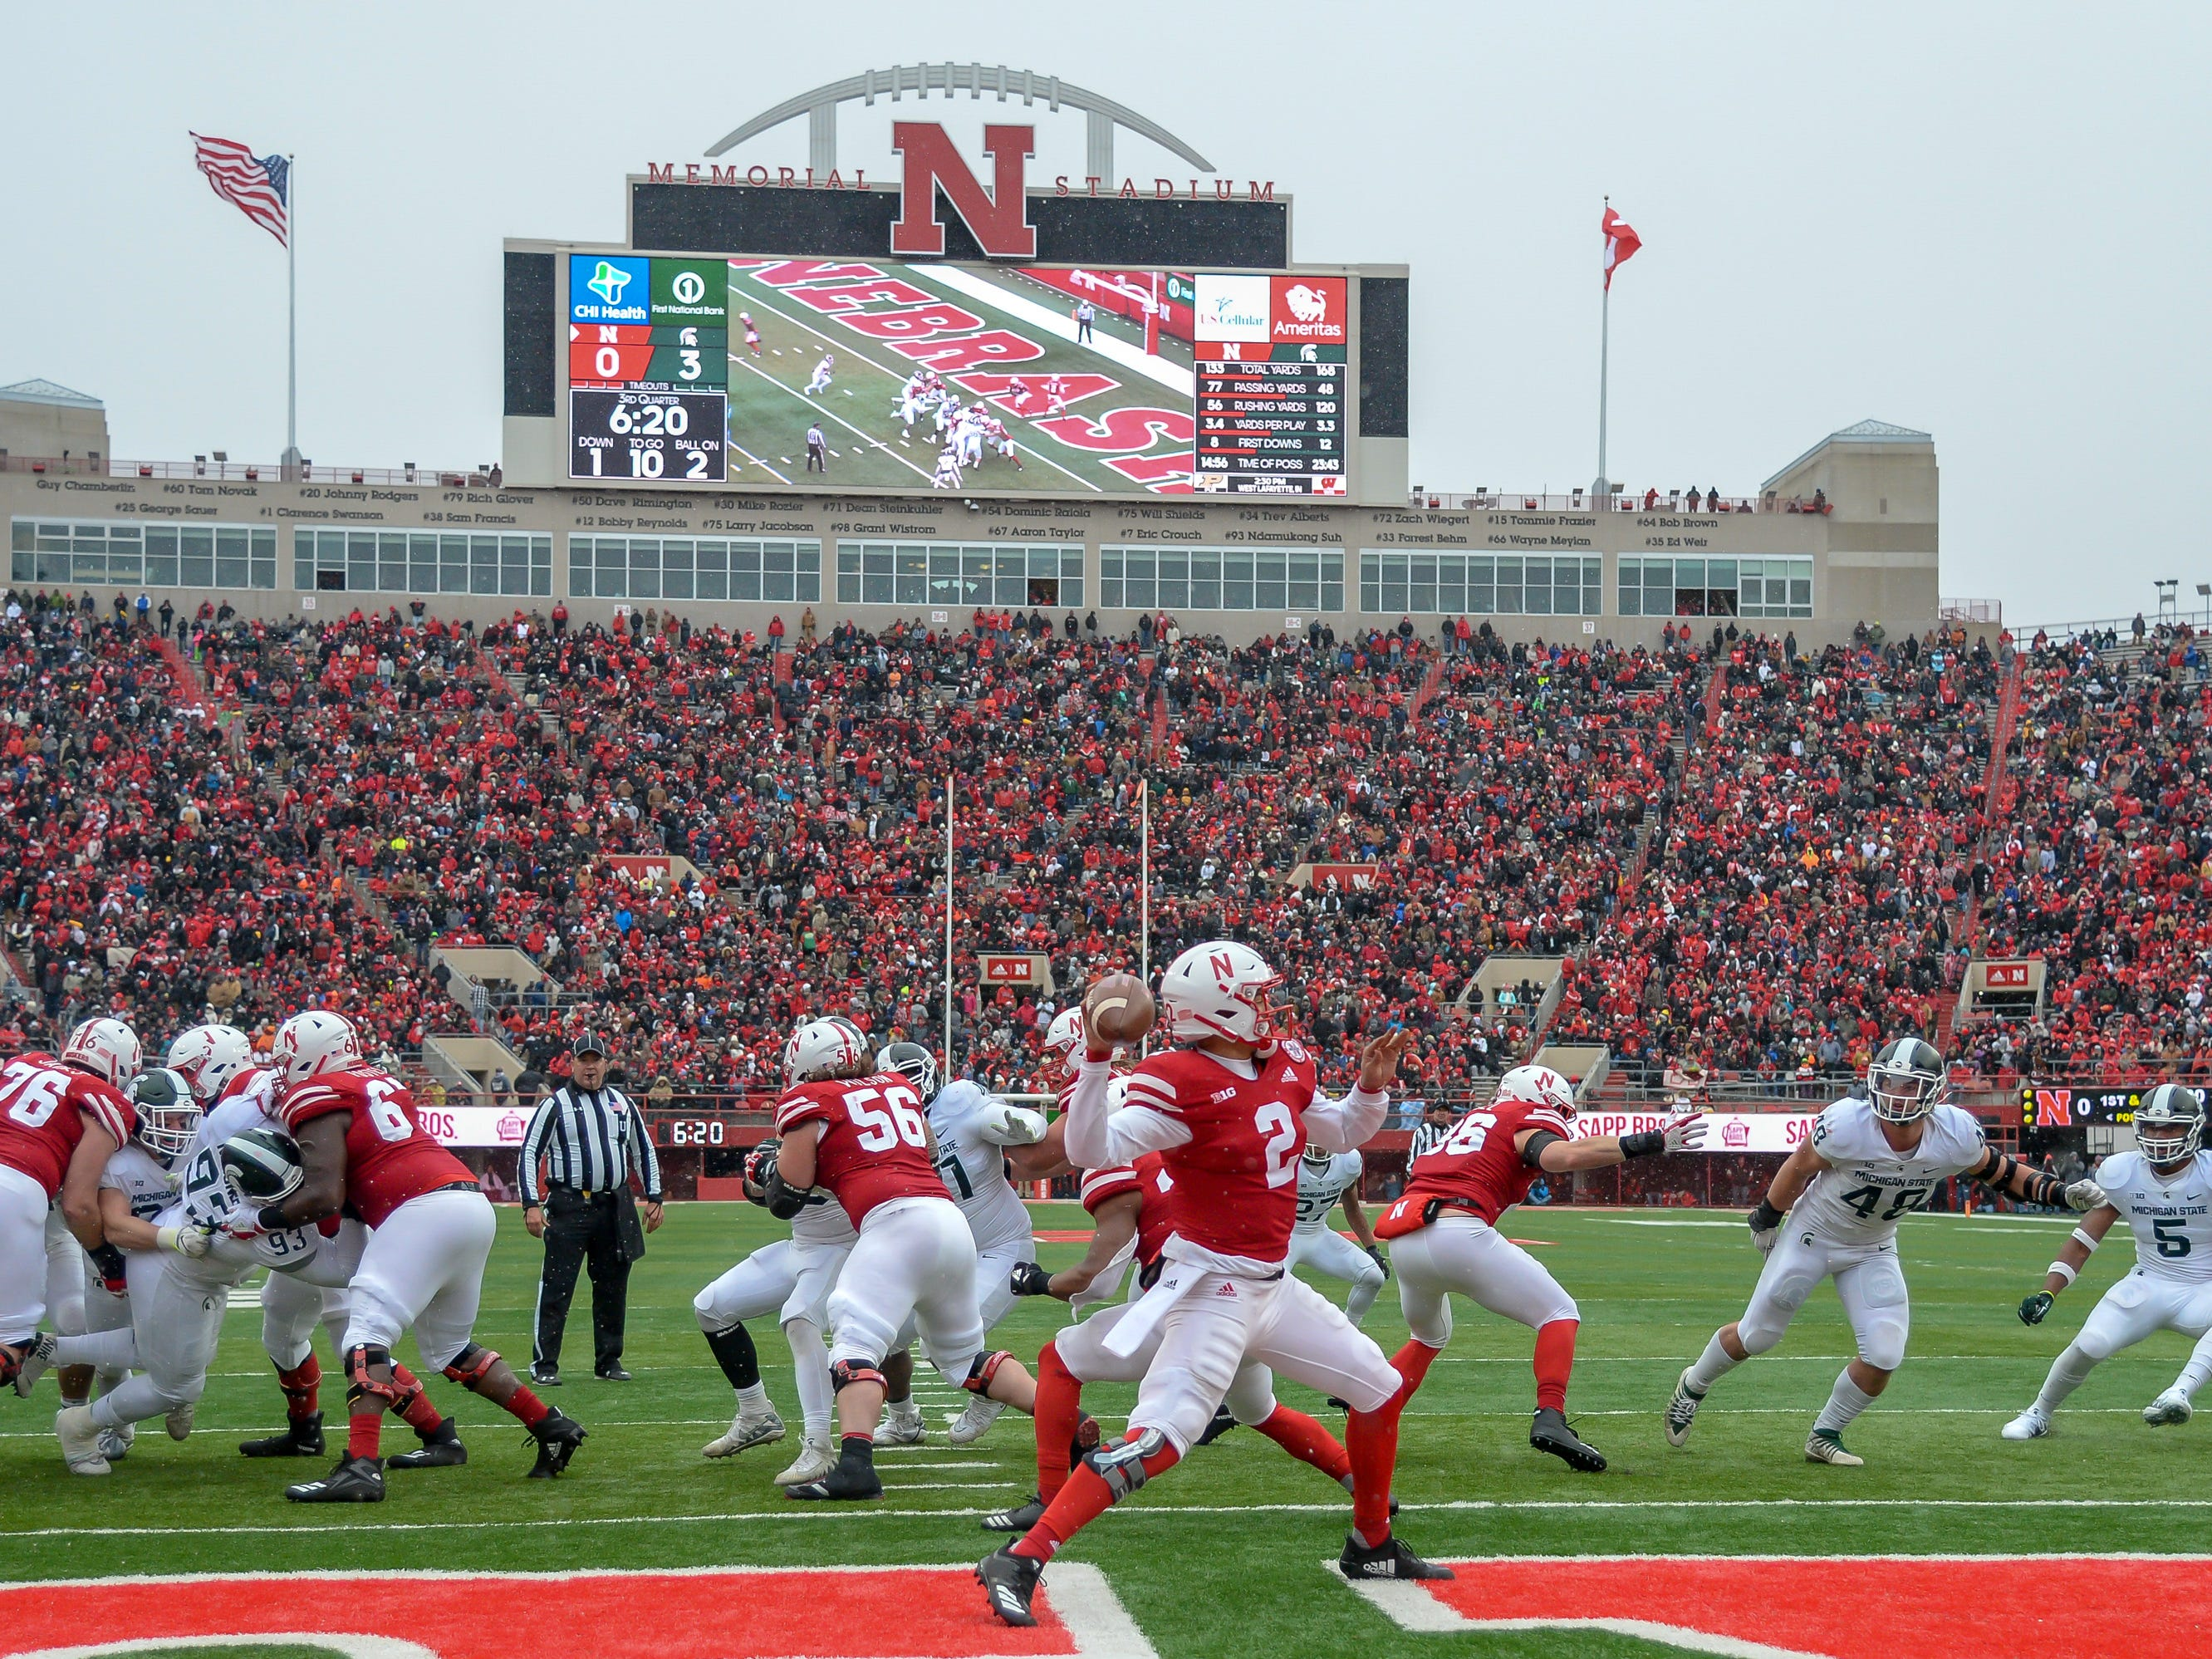 Michigan State plays at Nebraska in Memorial Stadium on Nov. 17, 2018 in Lincoln, Neb.